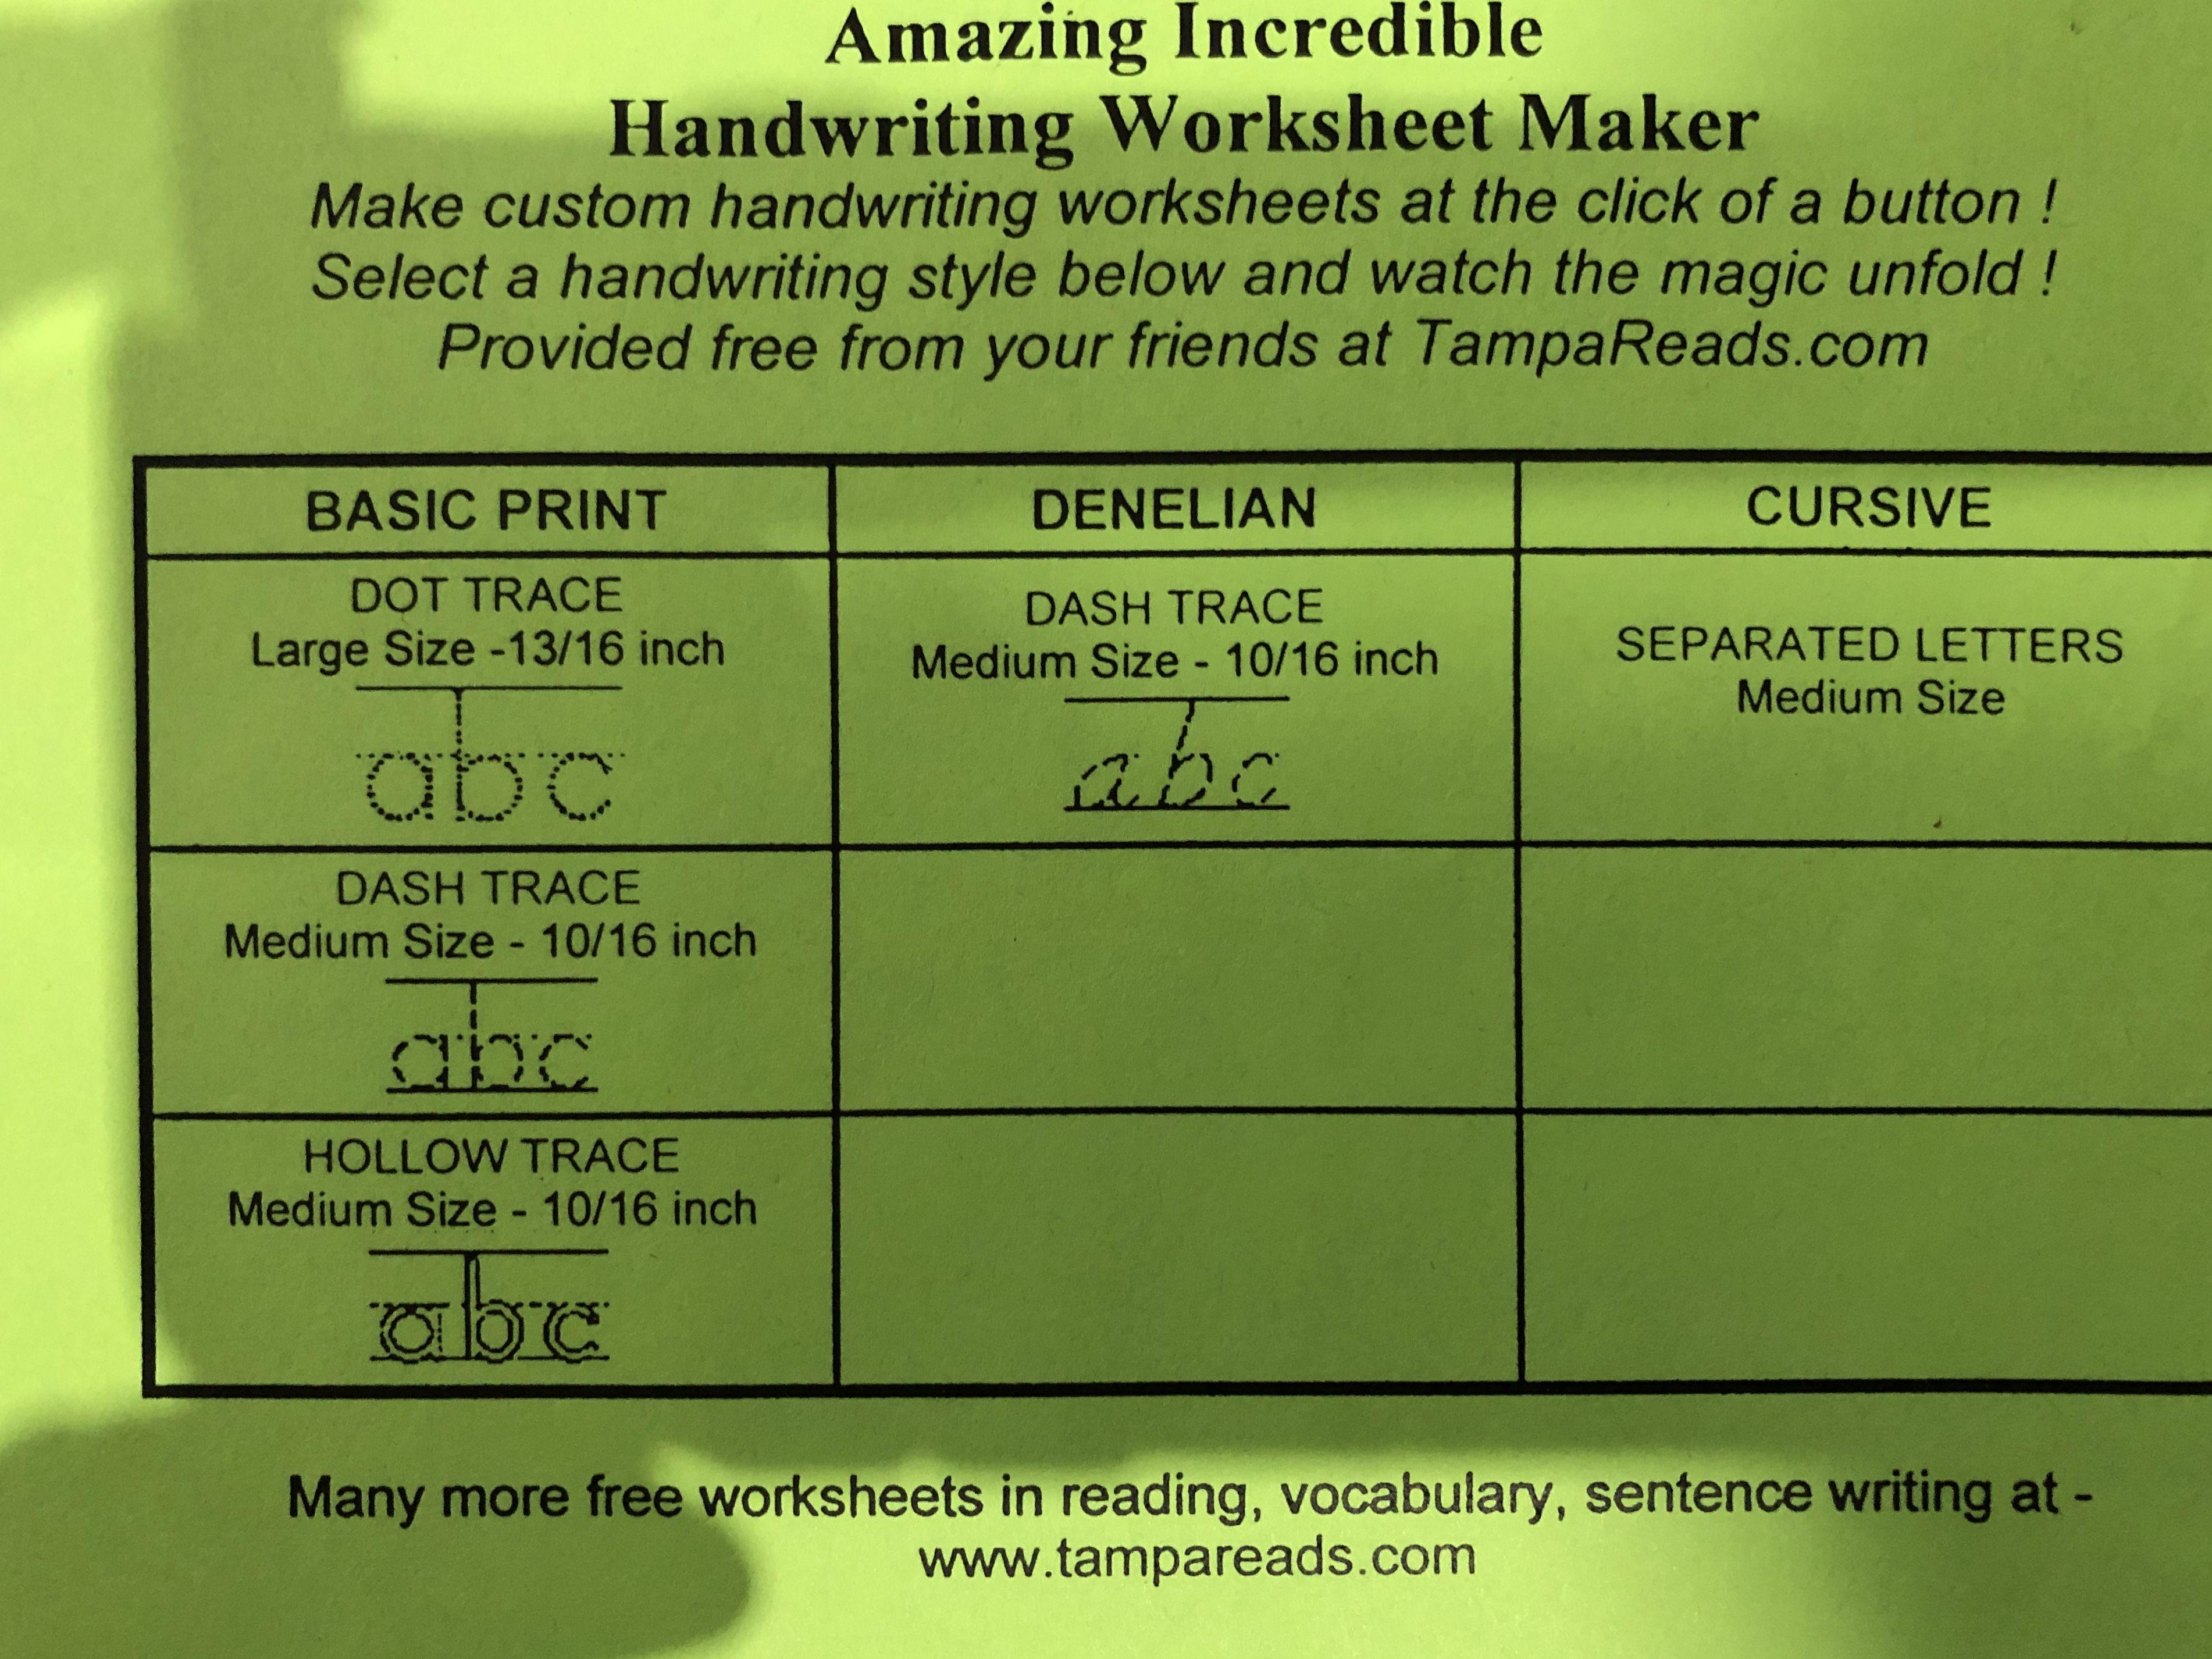 Pin By Lynne Maccall On Grandbaby Handwriting Worksheet Maker Handwriting Worksheets Handwriting Styles